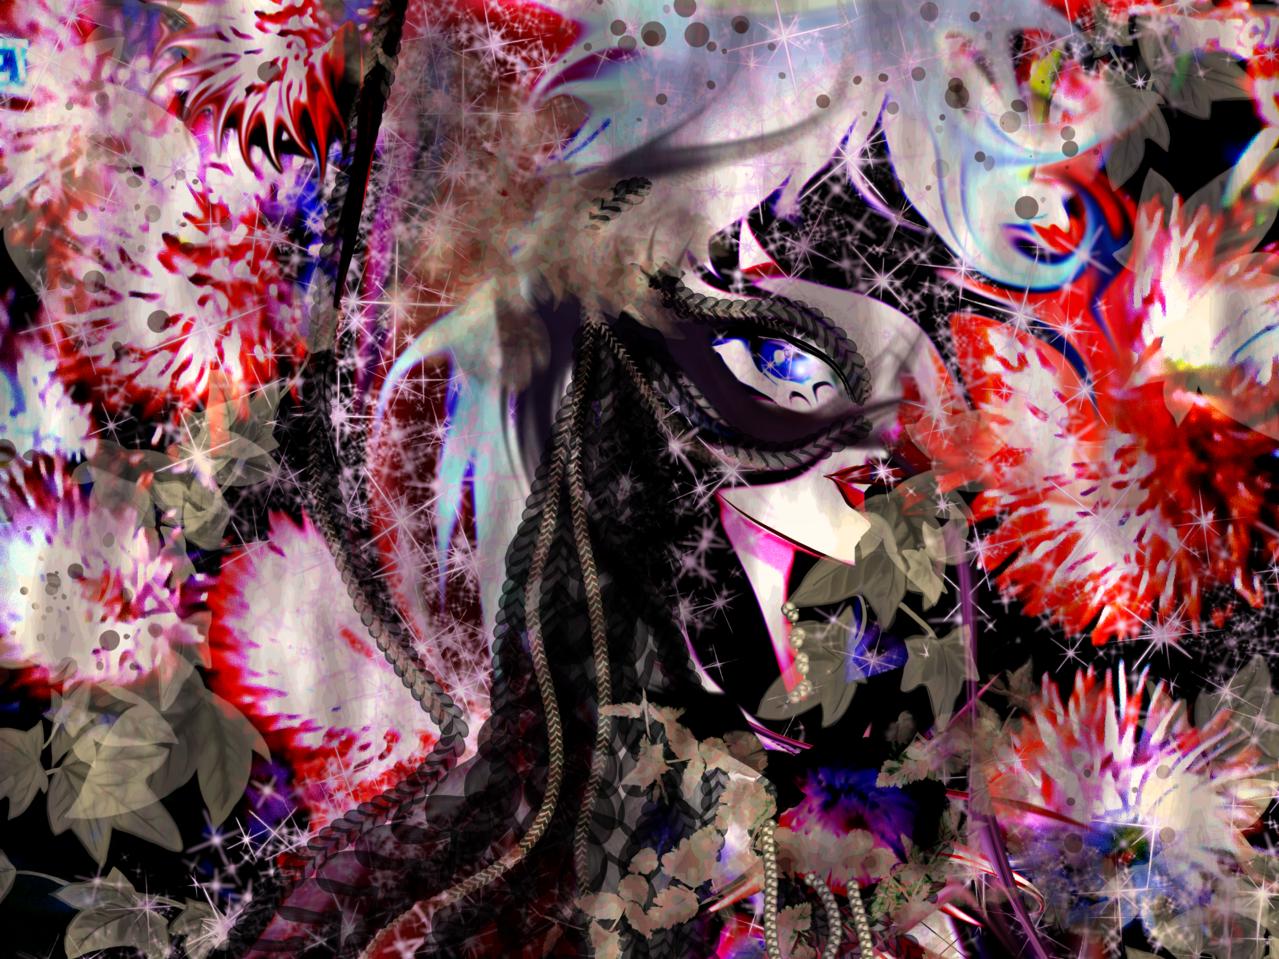 Behind the mask Illust of Grandicelli Susanna June2021_Anthropomorphism fiori anime FreeBrush maschera digitale